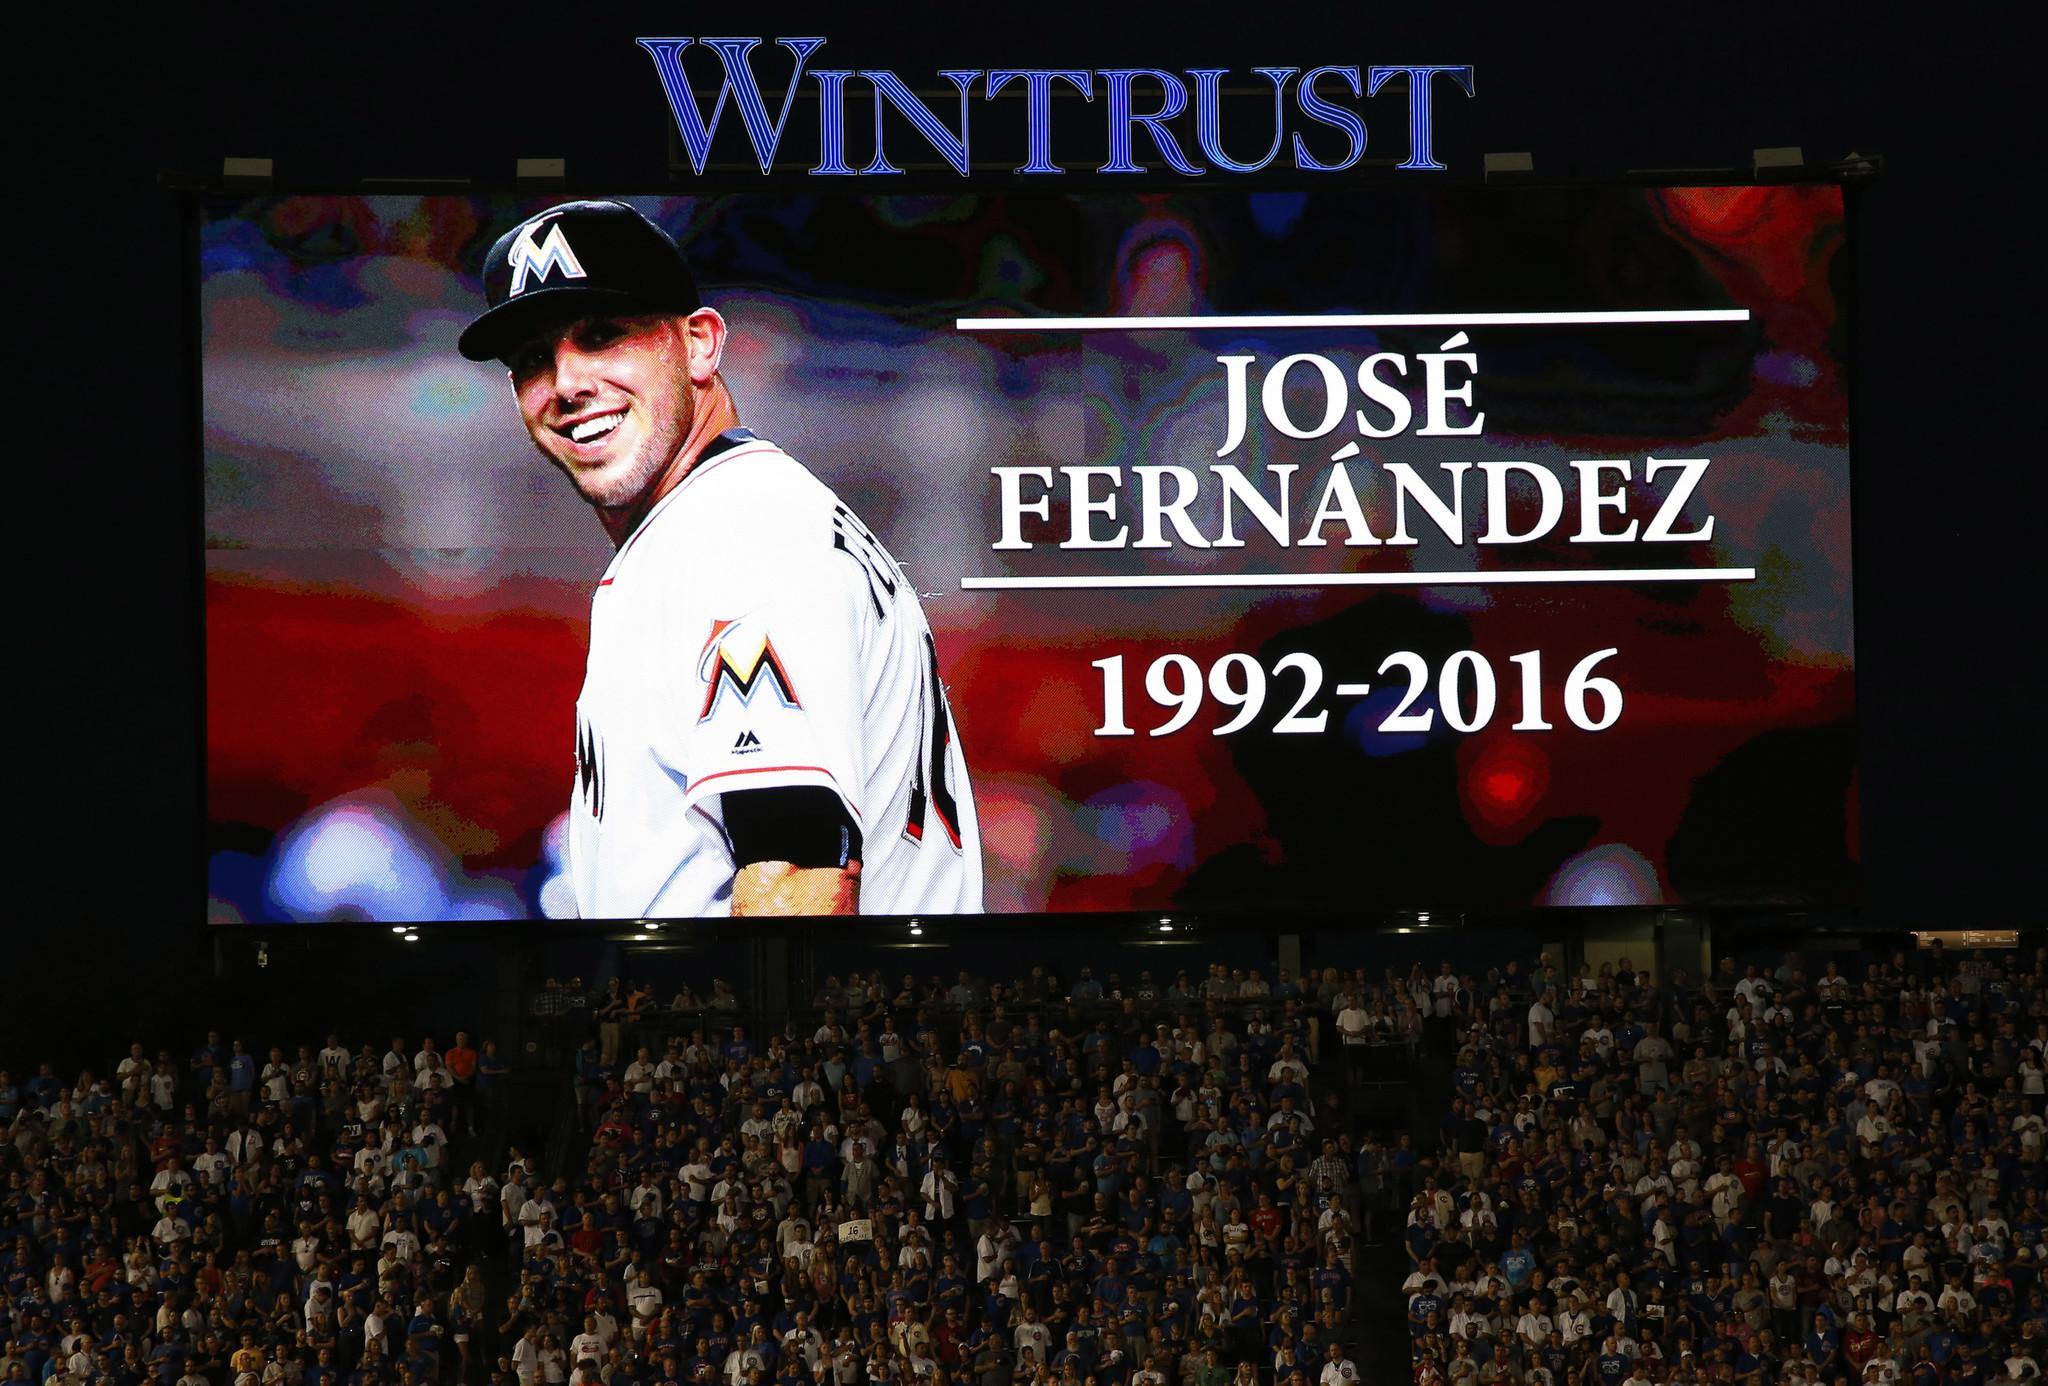 Sfl-cuban-ballplayers-mourn-the-loss-of-jose-fernandez-20160926